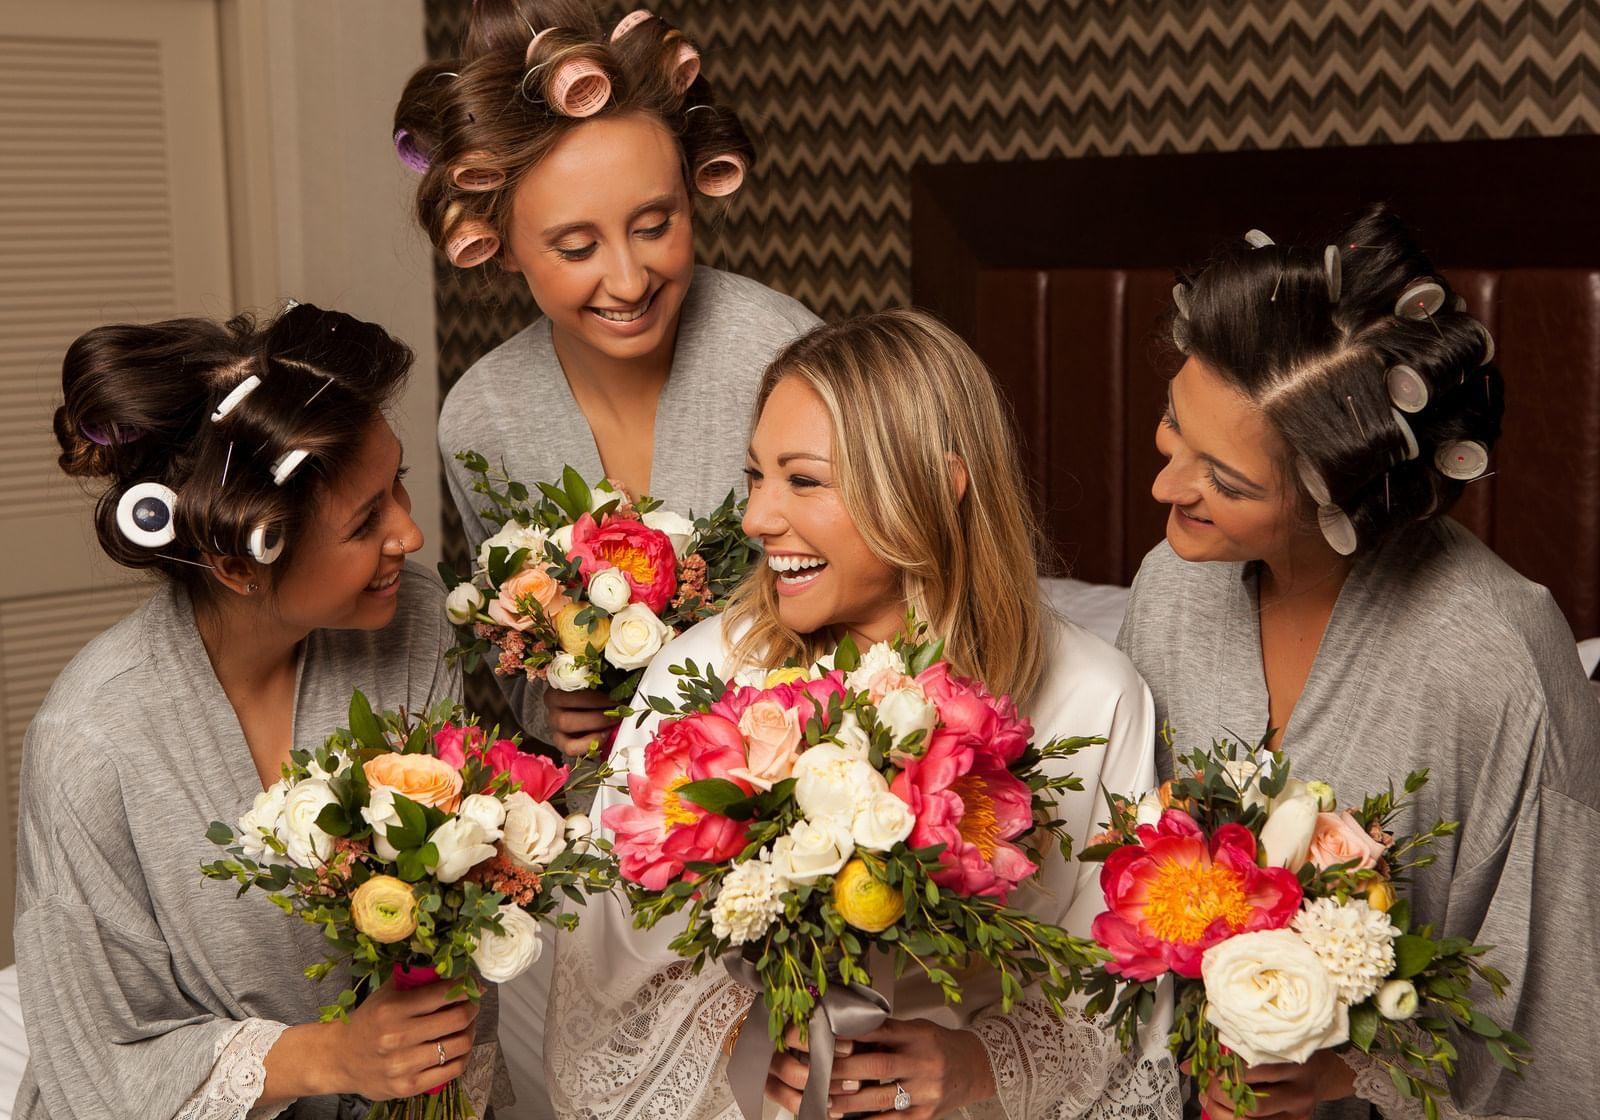 four women holding flowers